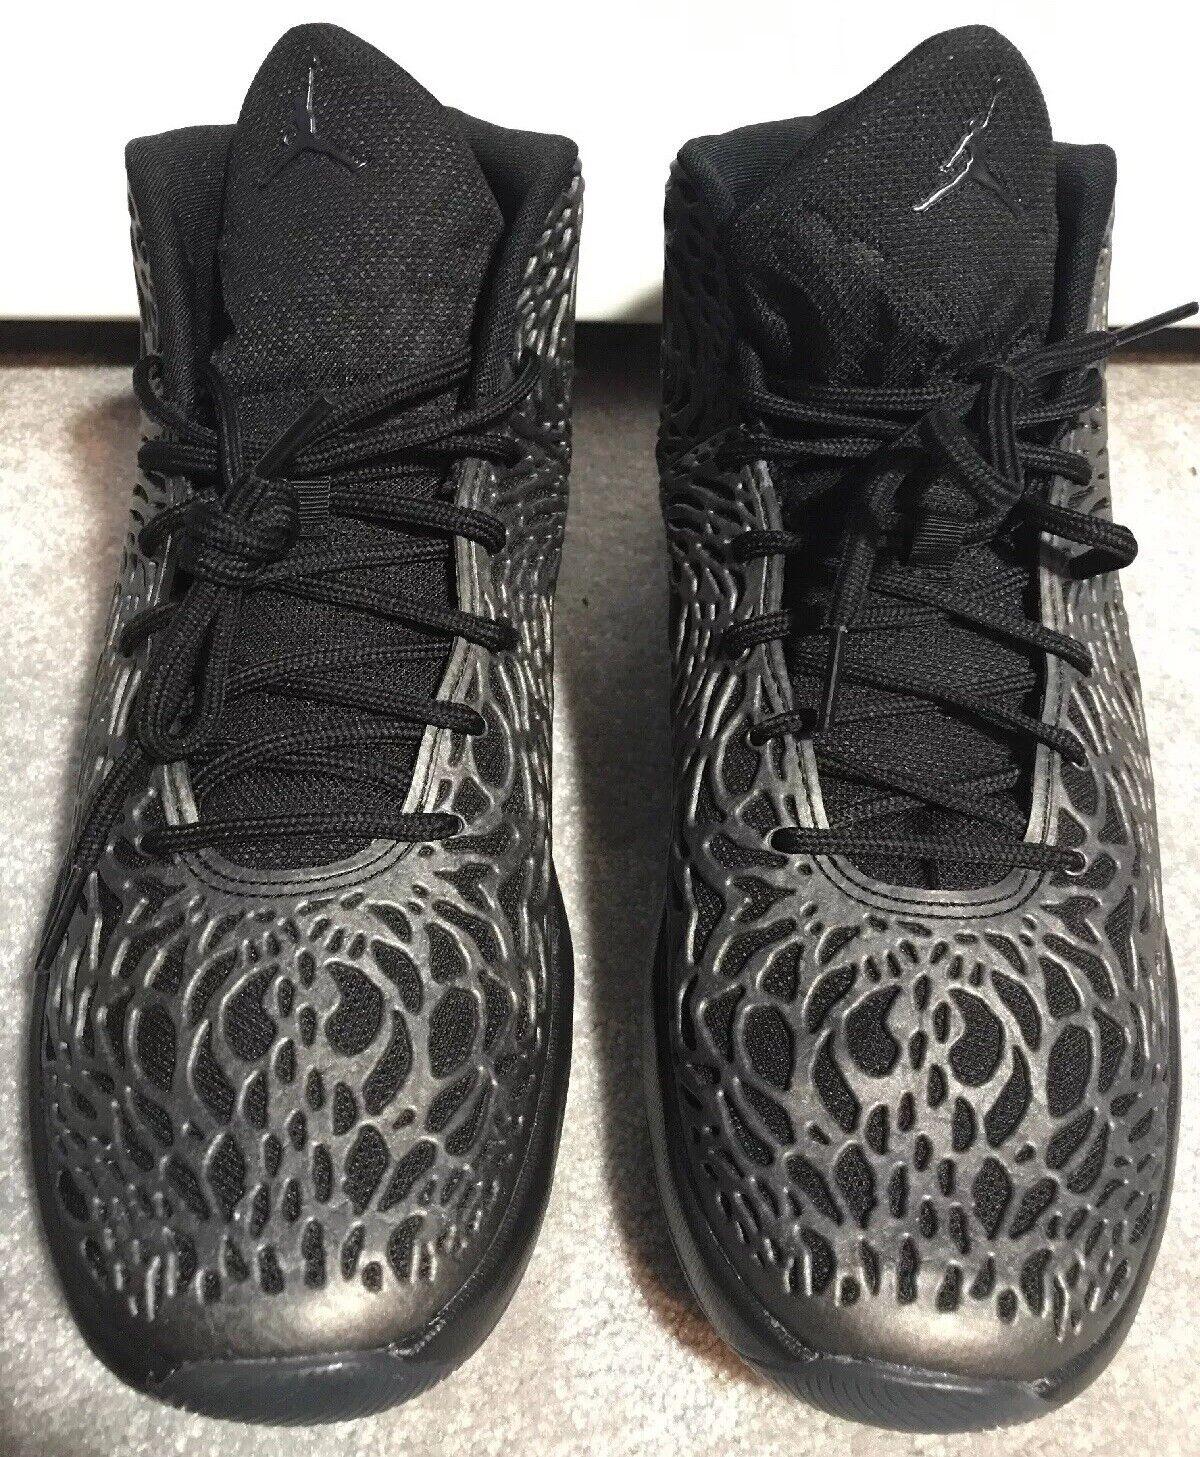 Nike Jordan Ultra Fly 834268-010 Dark Grey Mens Basketball shoes Size 11.5